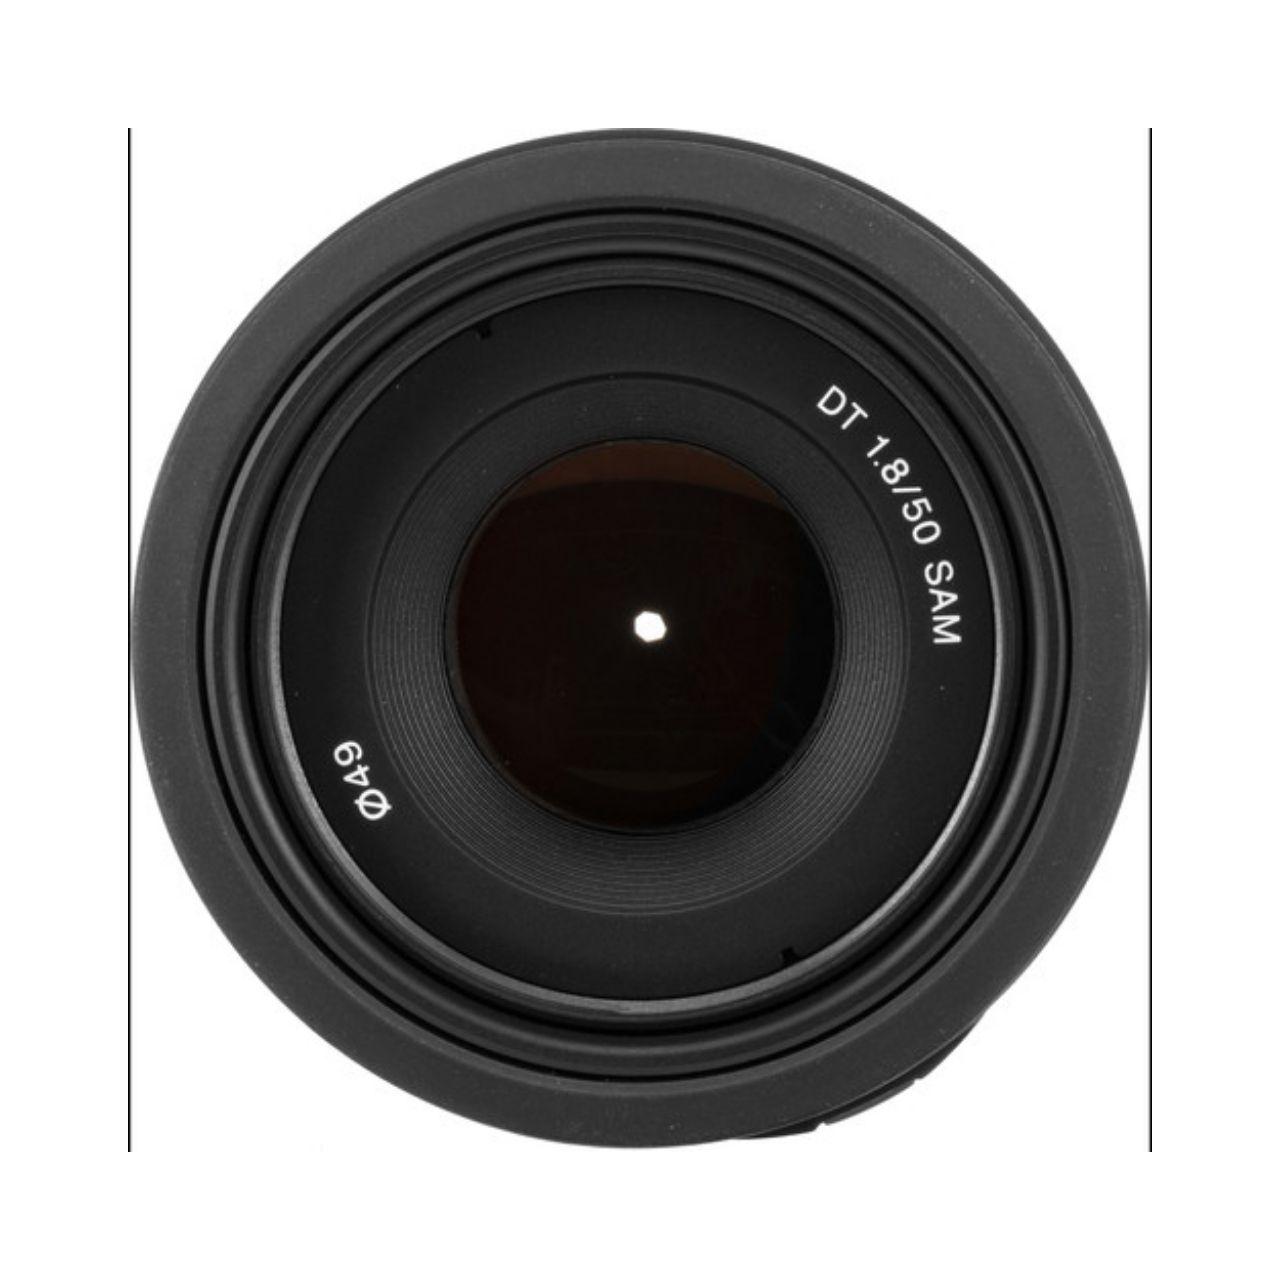 Sony Objetivo 50mm f/1.8